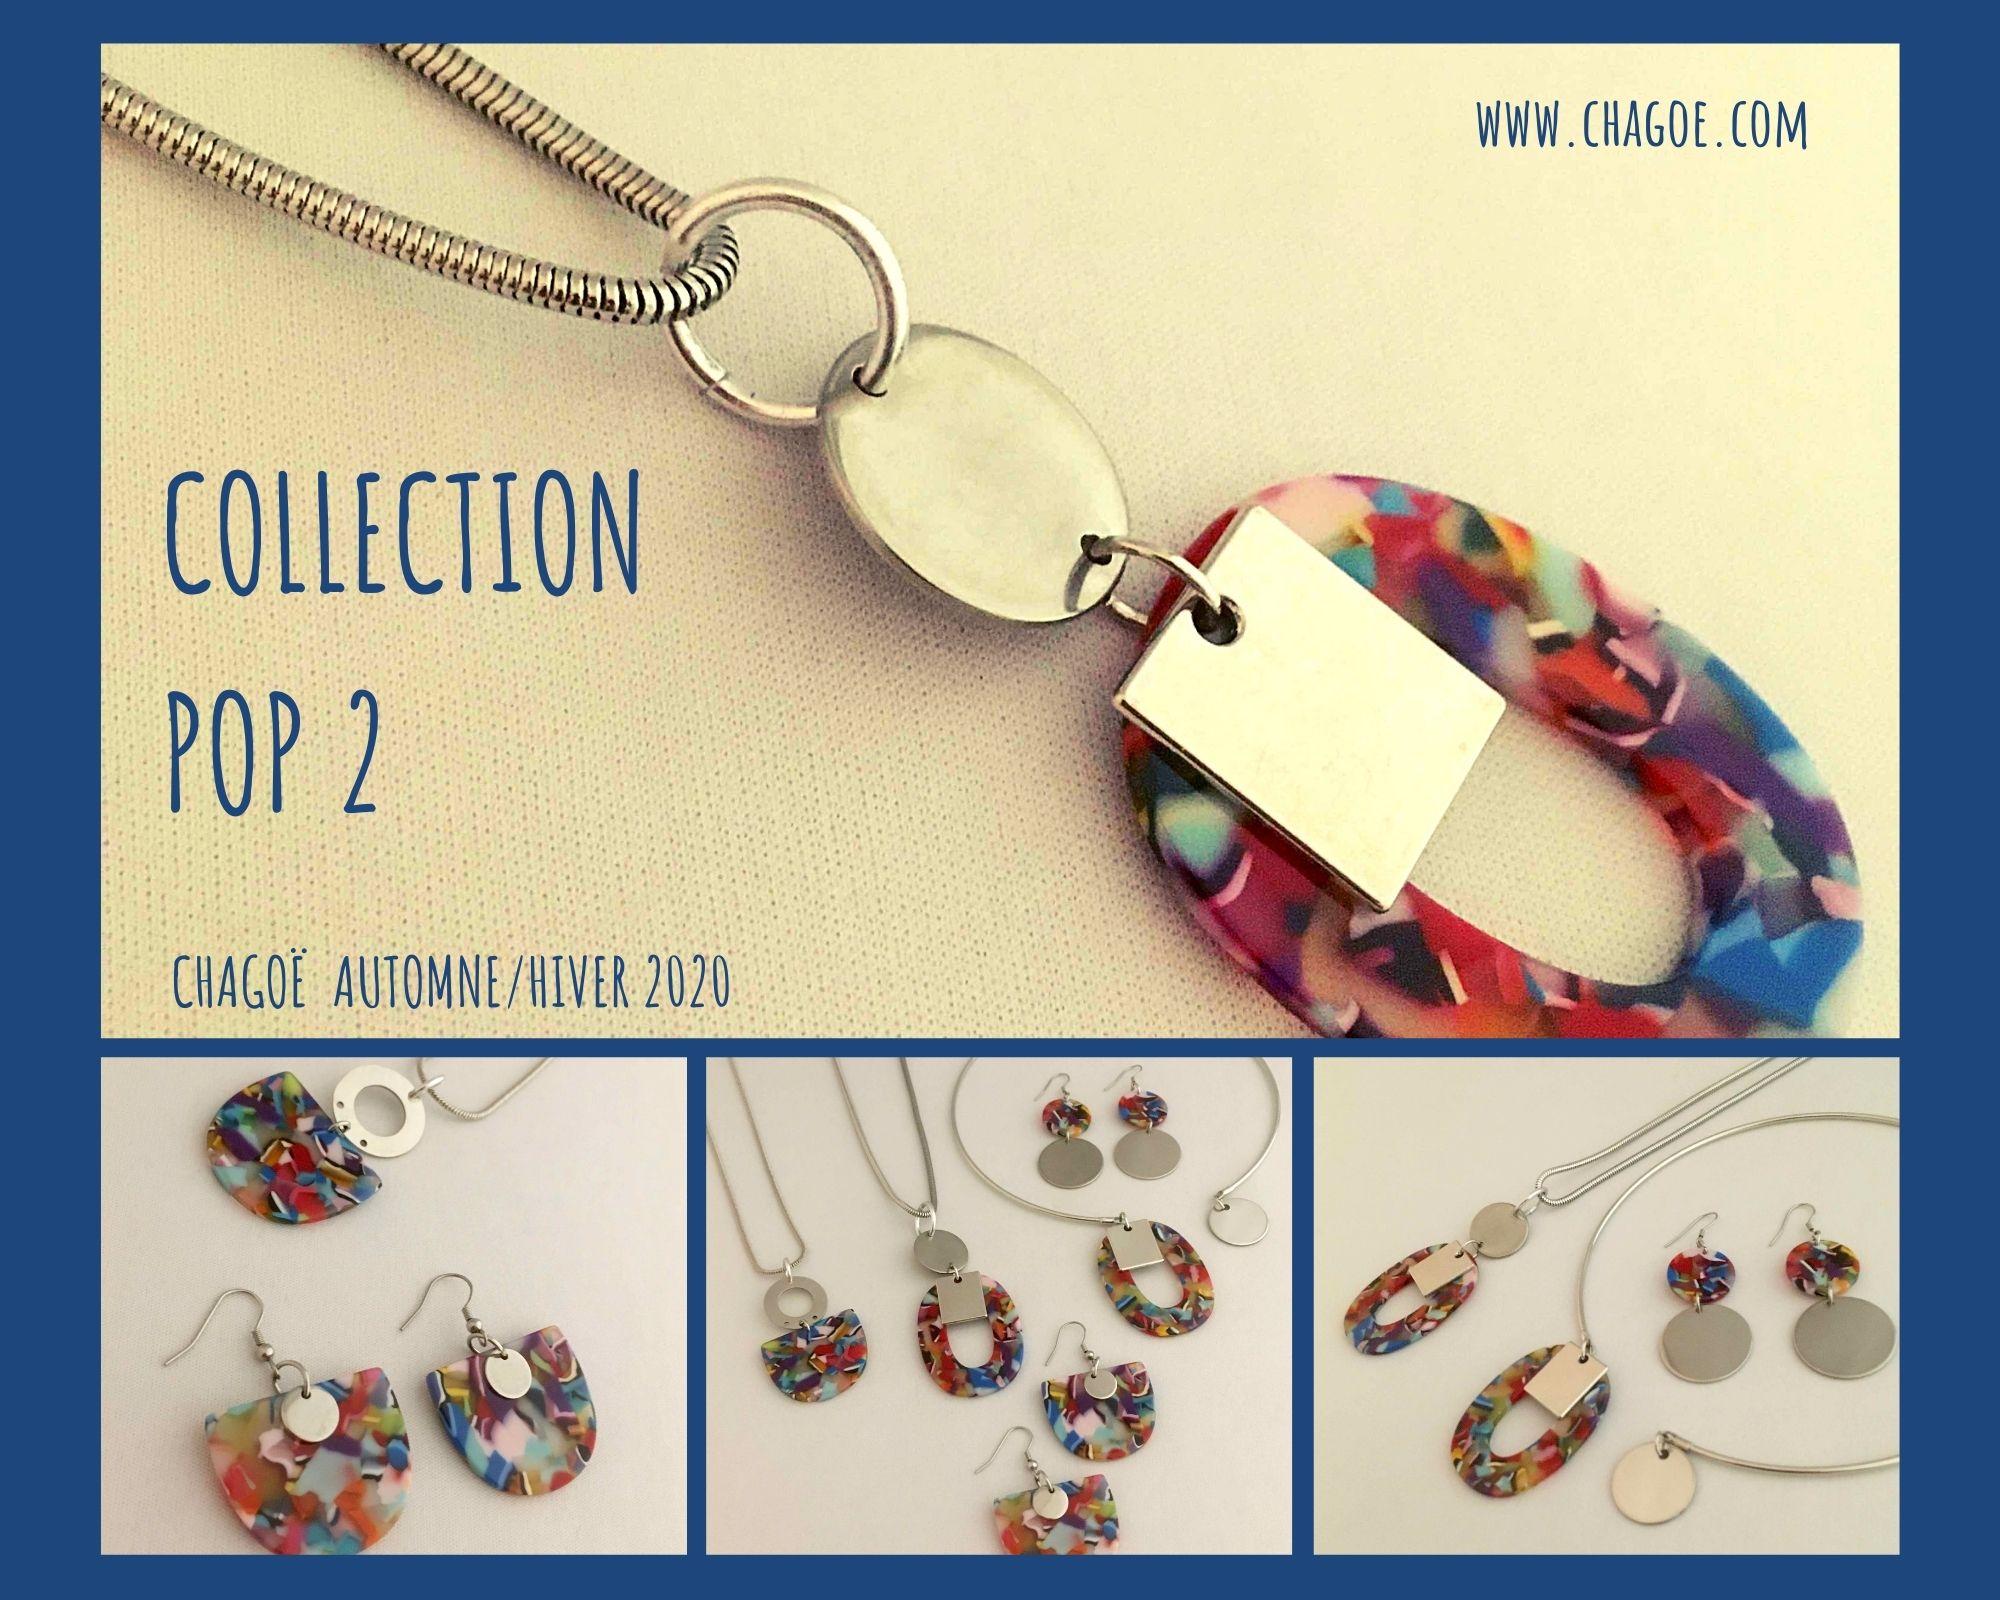 Collection POP 2 Chagoë 2020